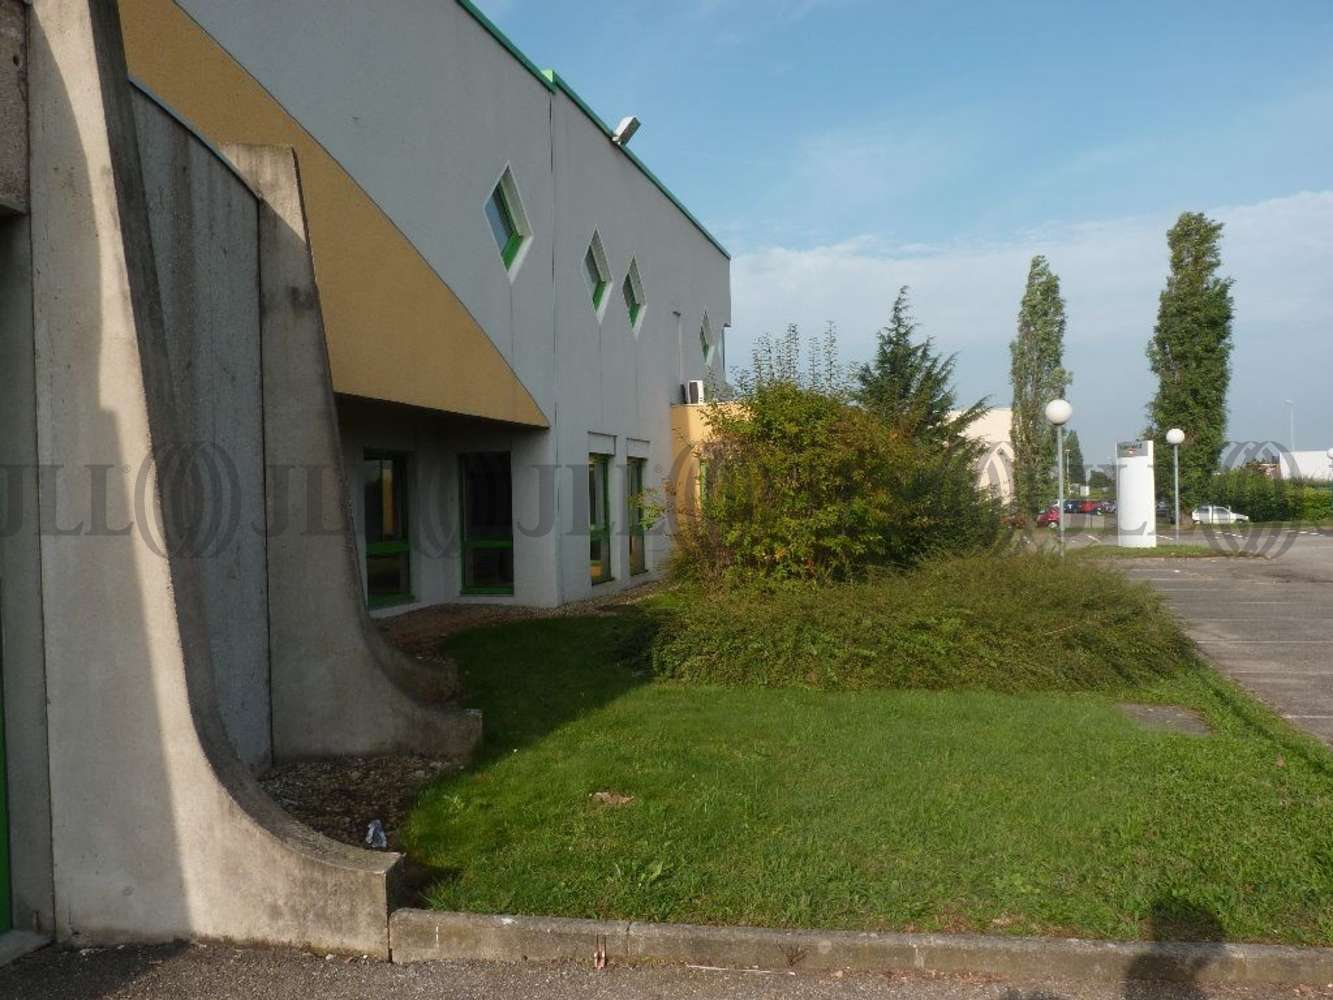 Activités/entrepôt Genas, 69740 - Location entrepot Genas - Lyon Est (69) - 10322576